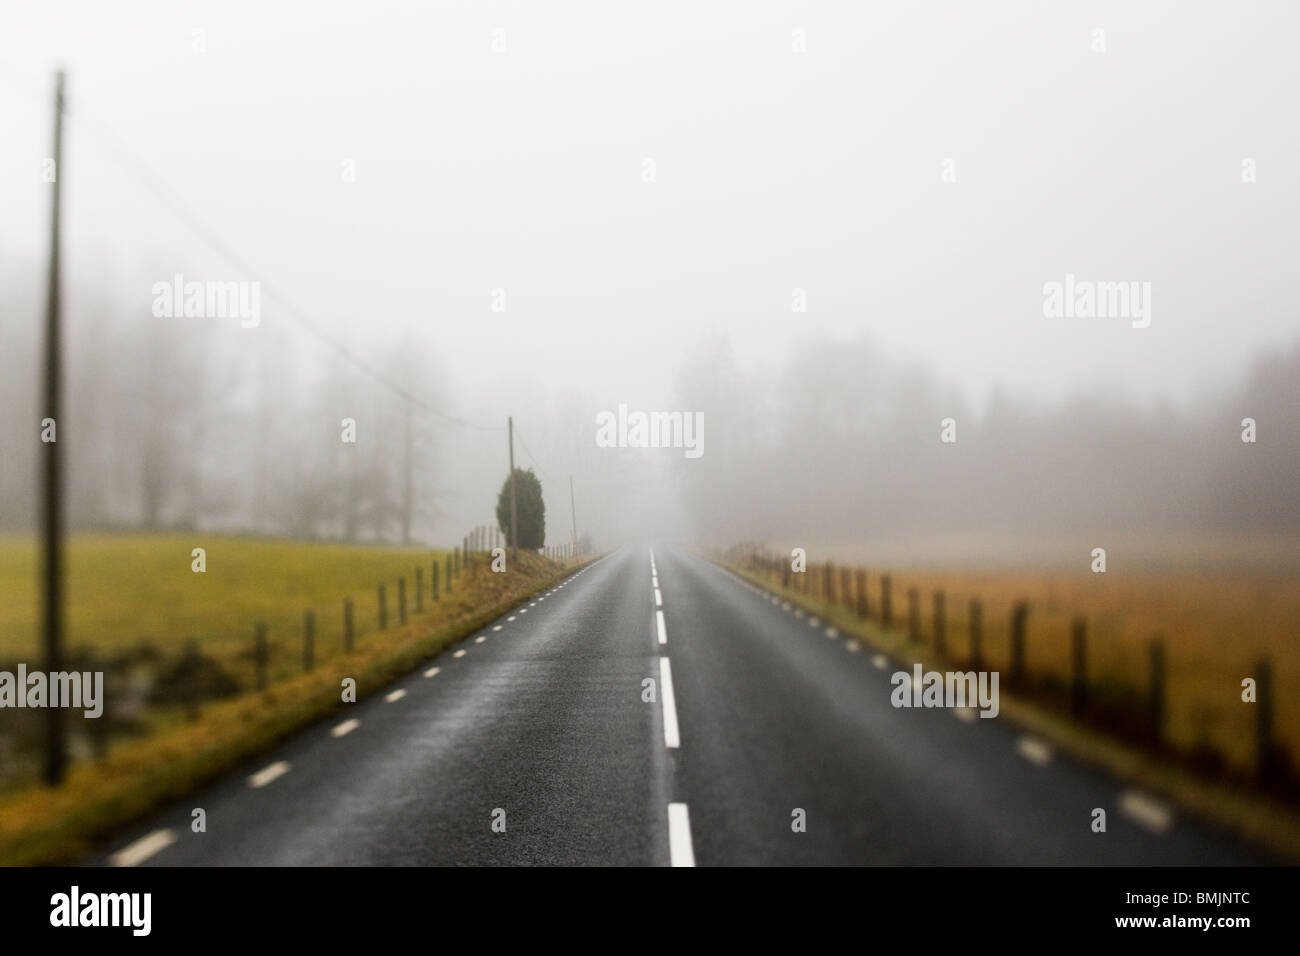 Scandinavian Peninsula, Sweden, Skane, View of empty country road through landscape - Stock Image